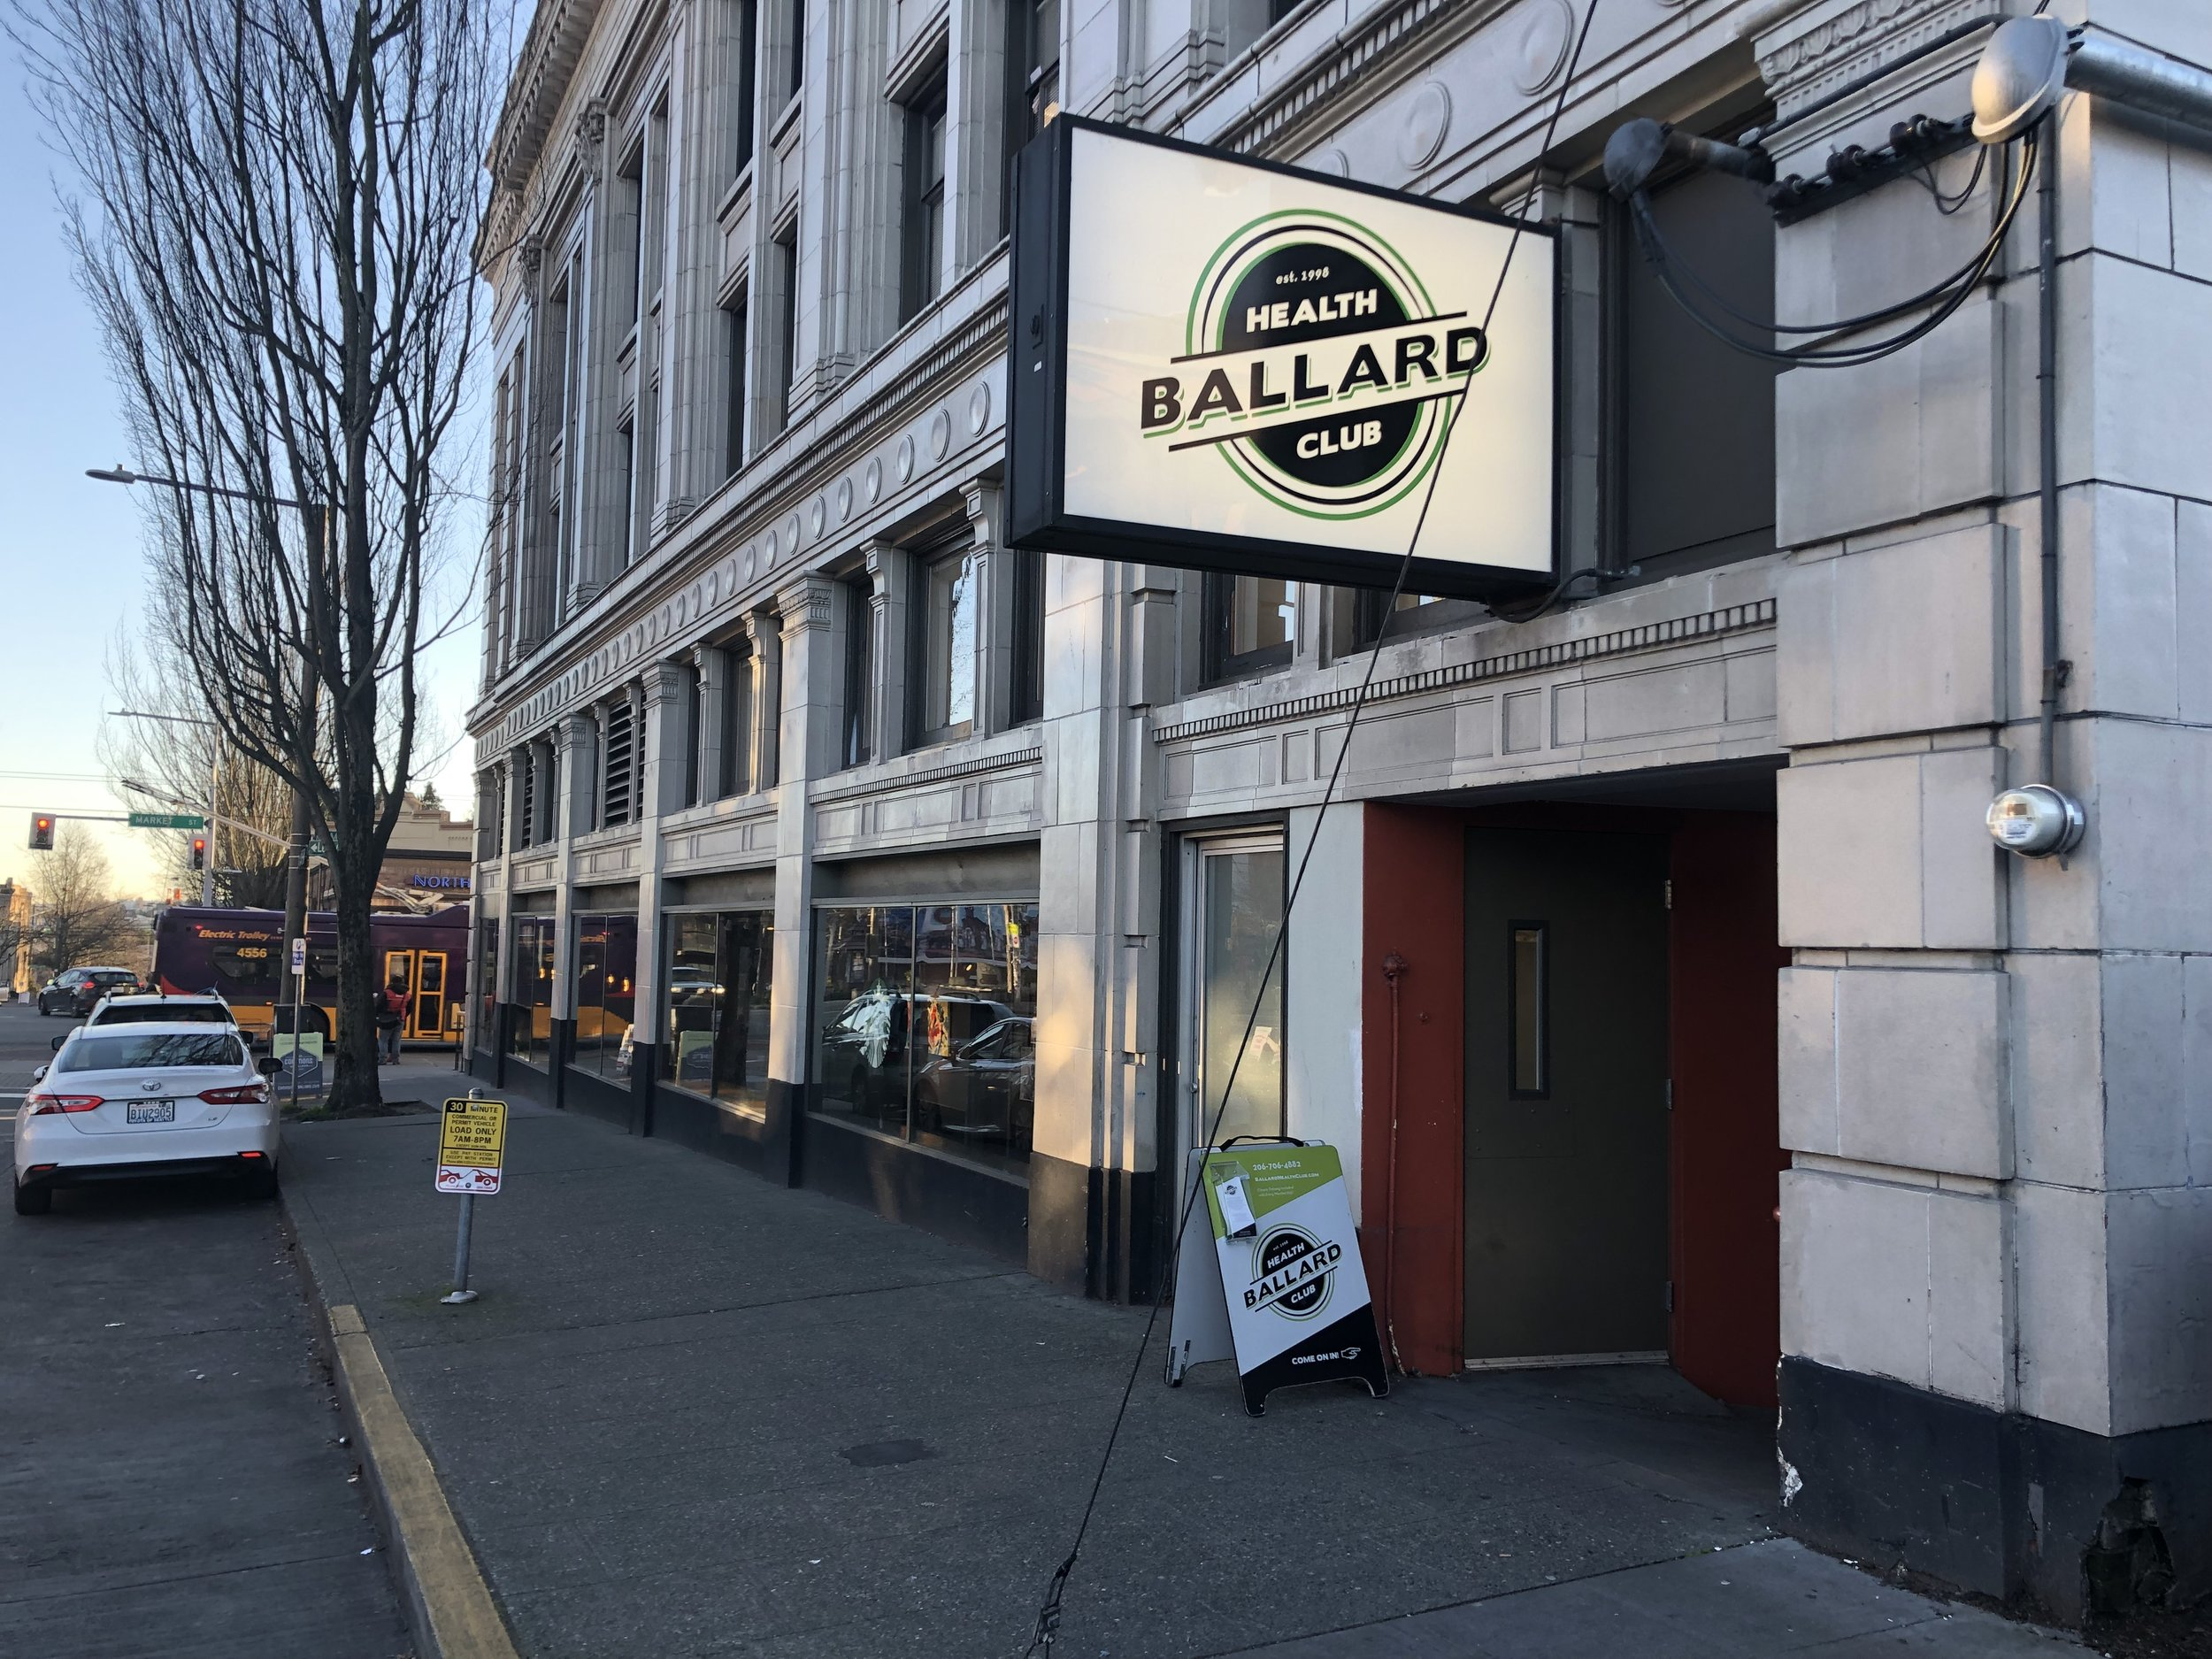 Ballard Health Club